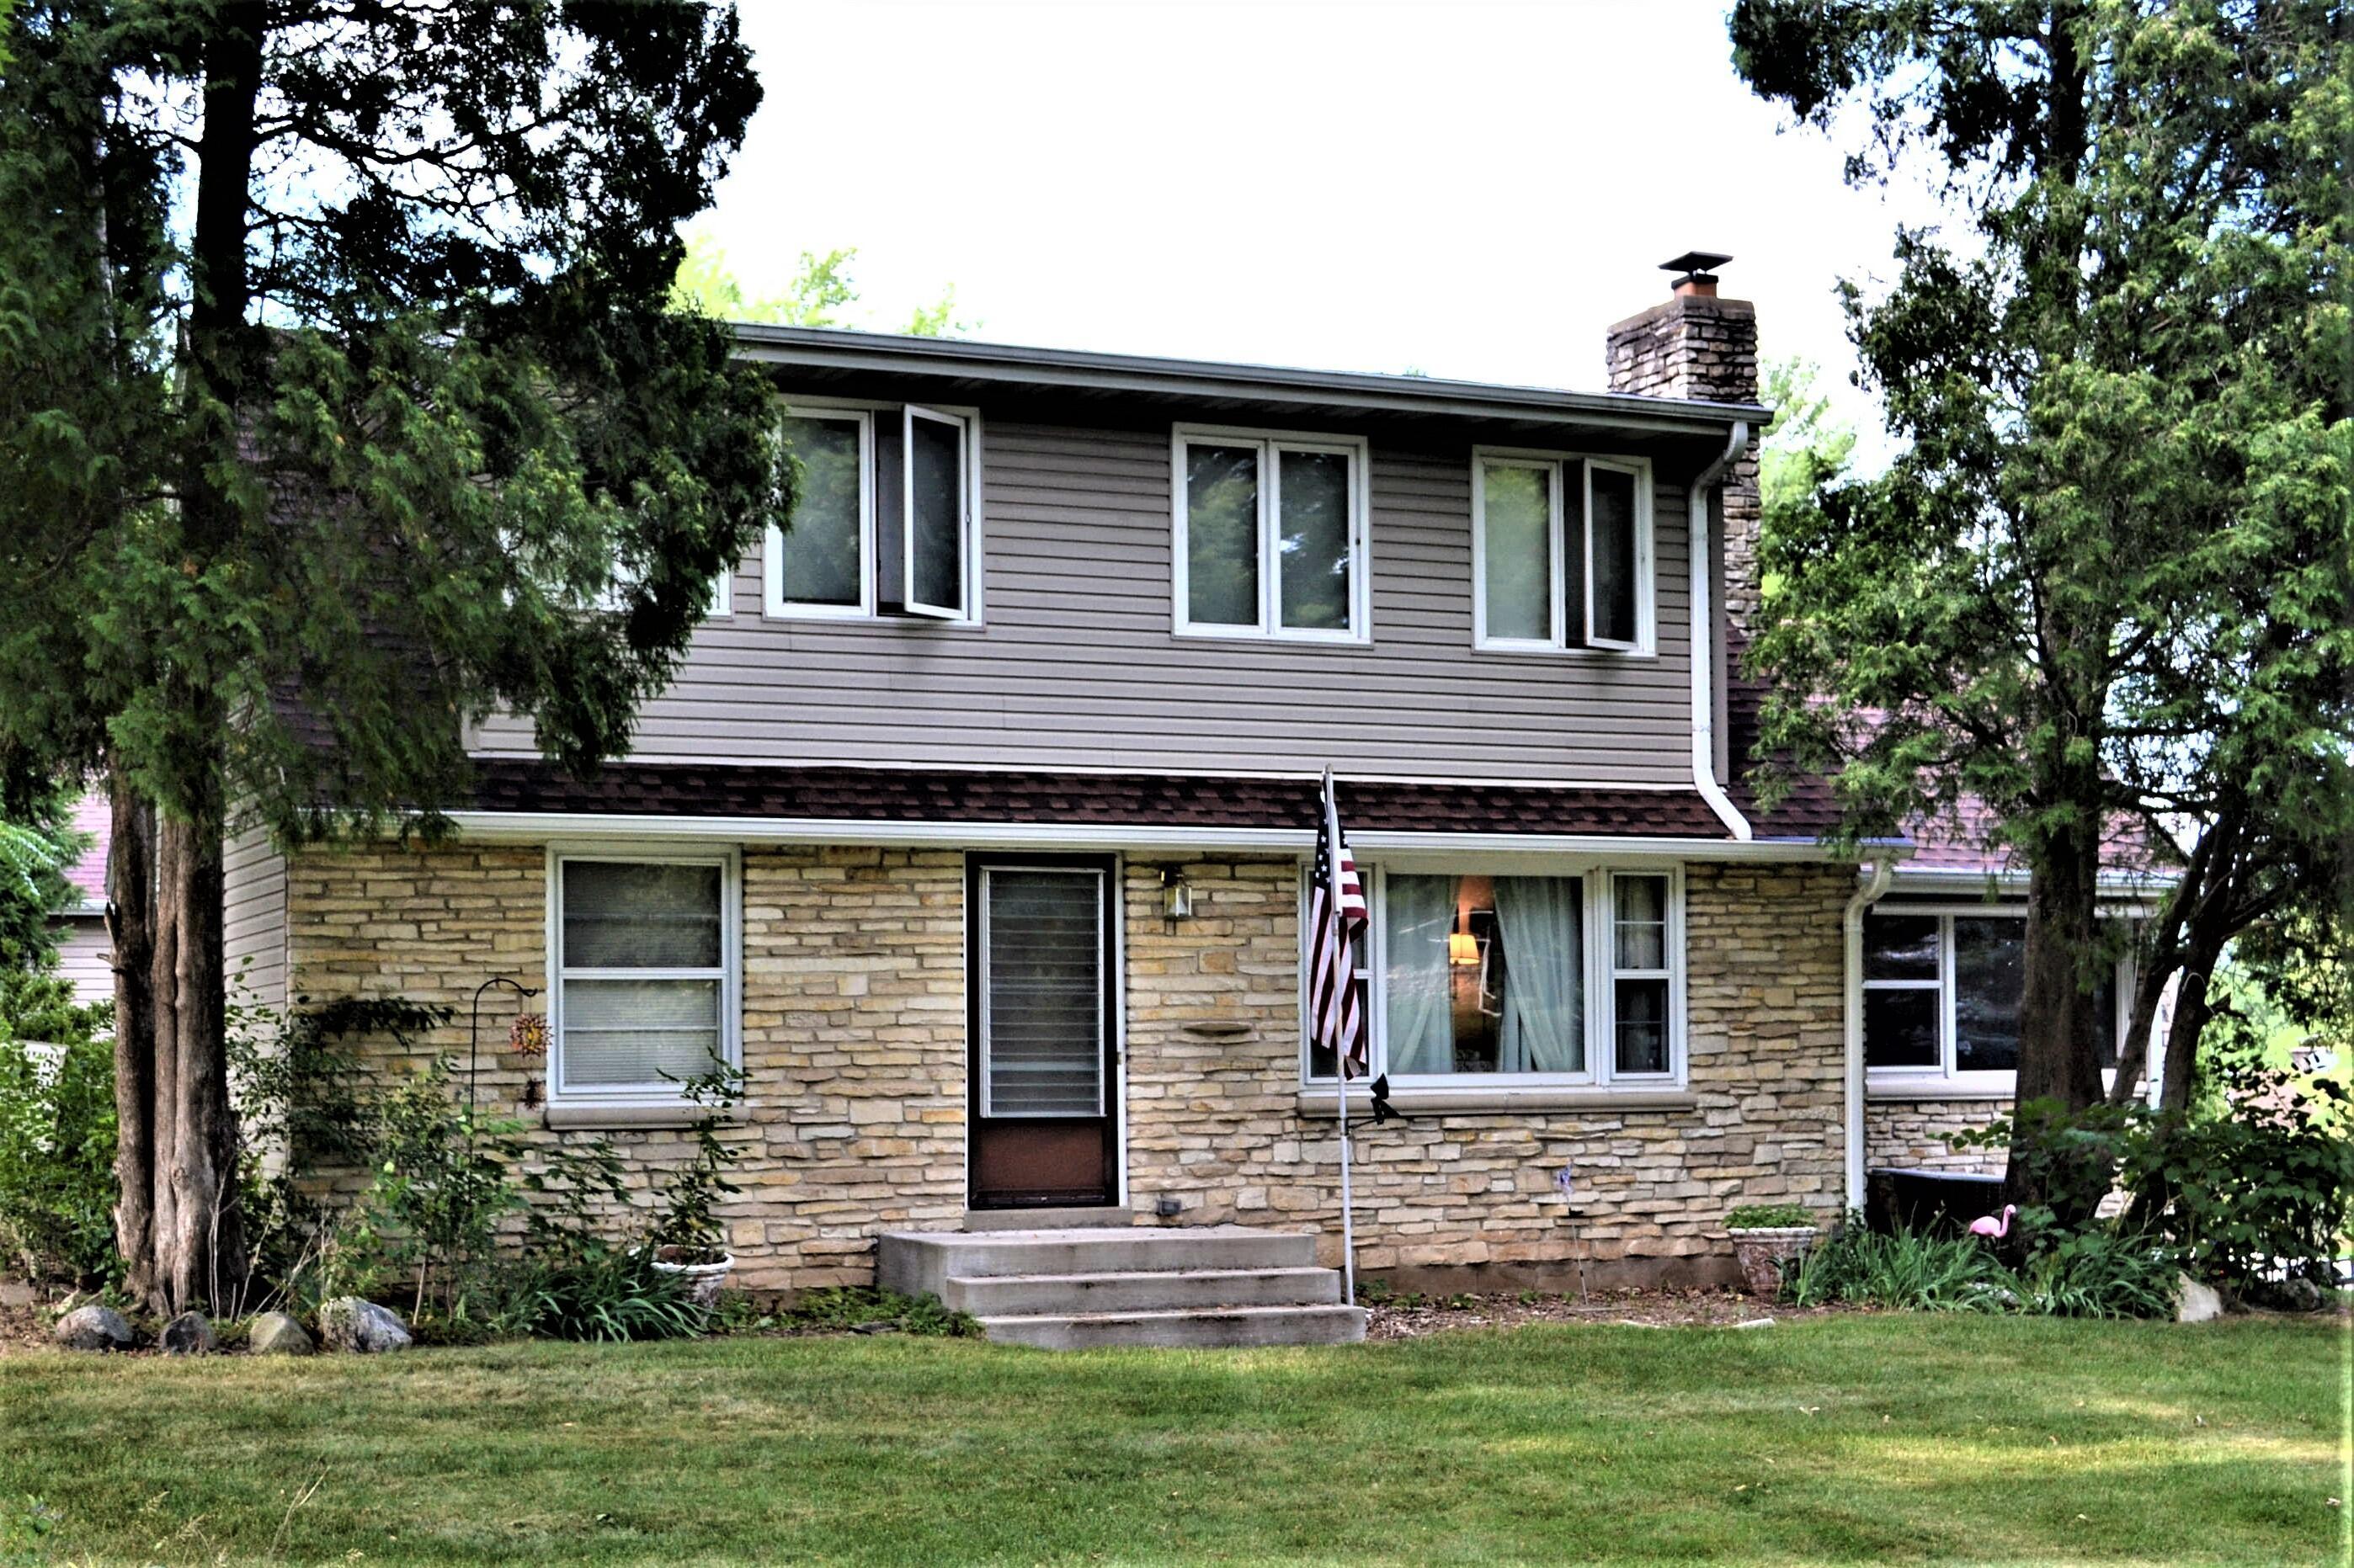 13340 Tremont St, Brookfield, Wisconsin 53005, 4 Bedrooms Bedrooms, 7 Rooms Rooms,2 BathroomsBathrooms,Single-Family,For Sale,Tremont St,1767345